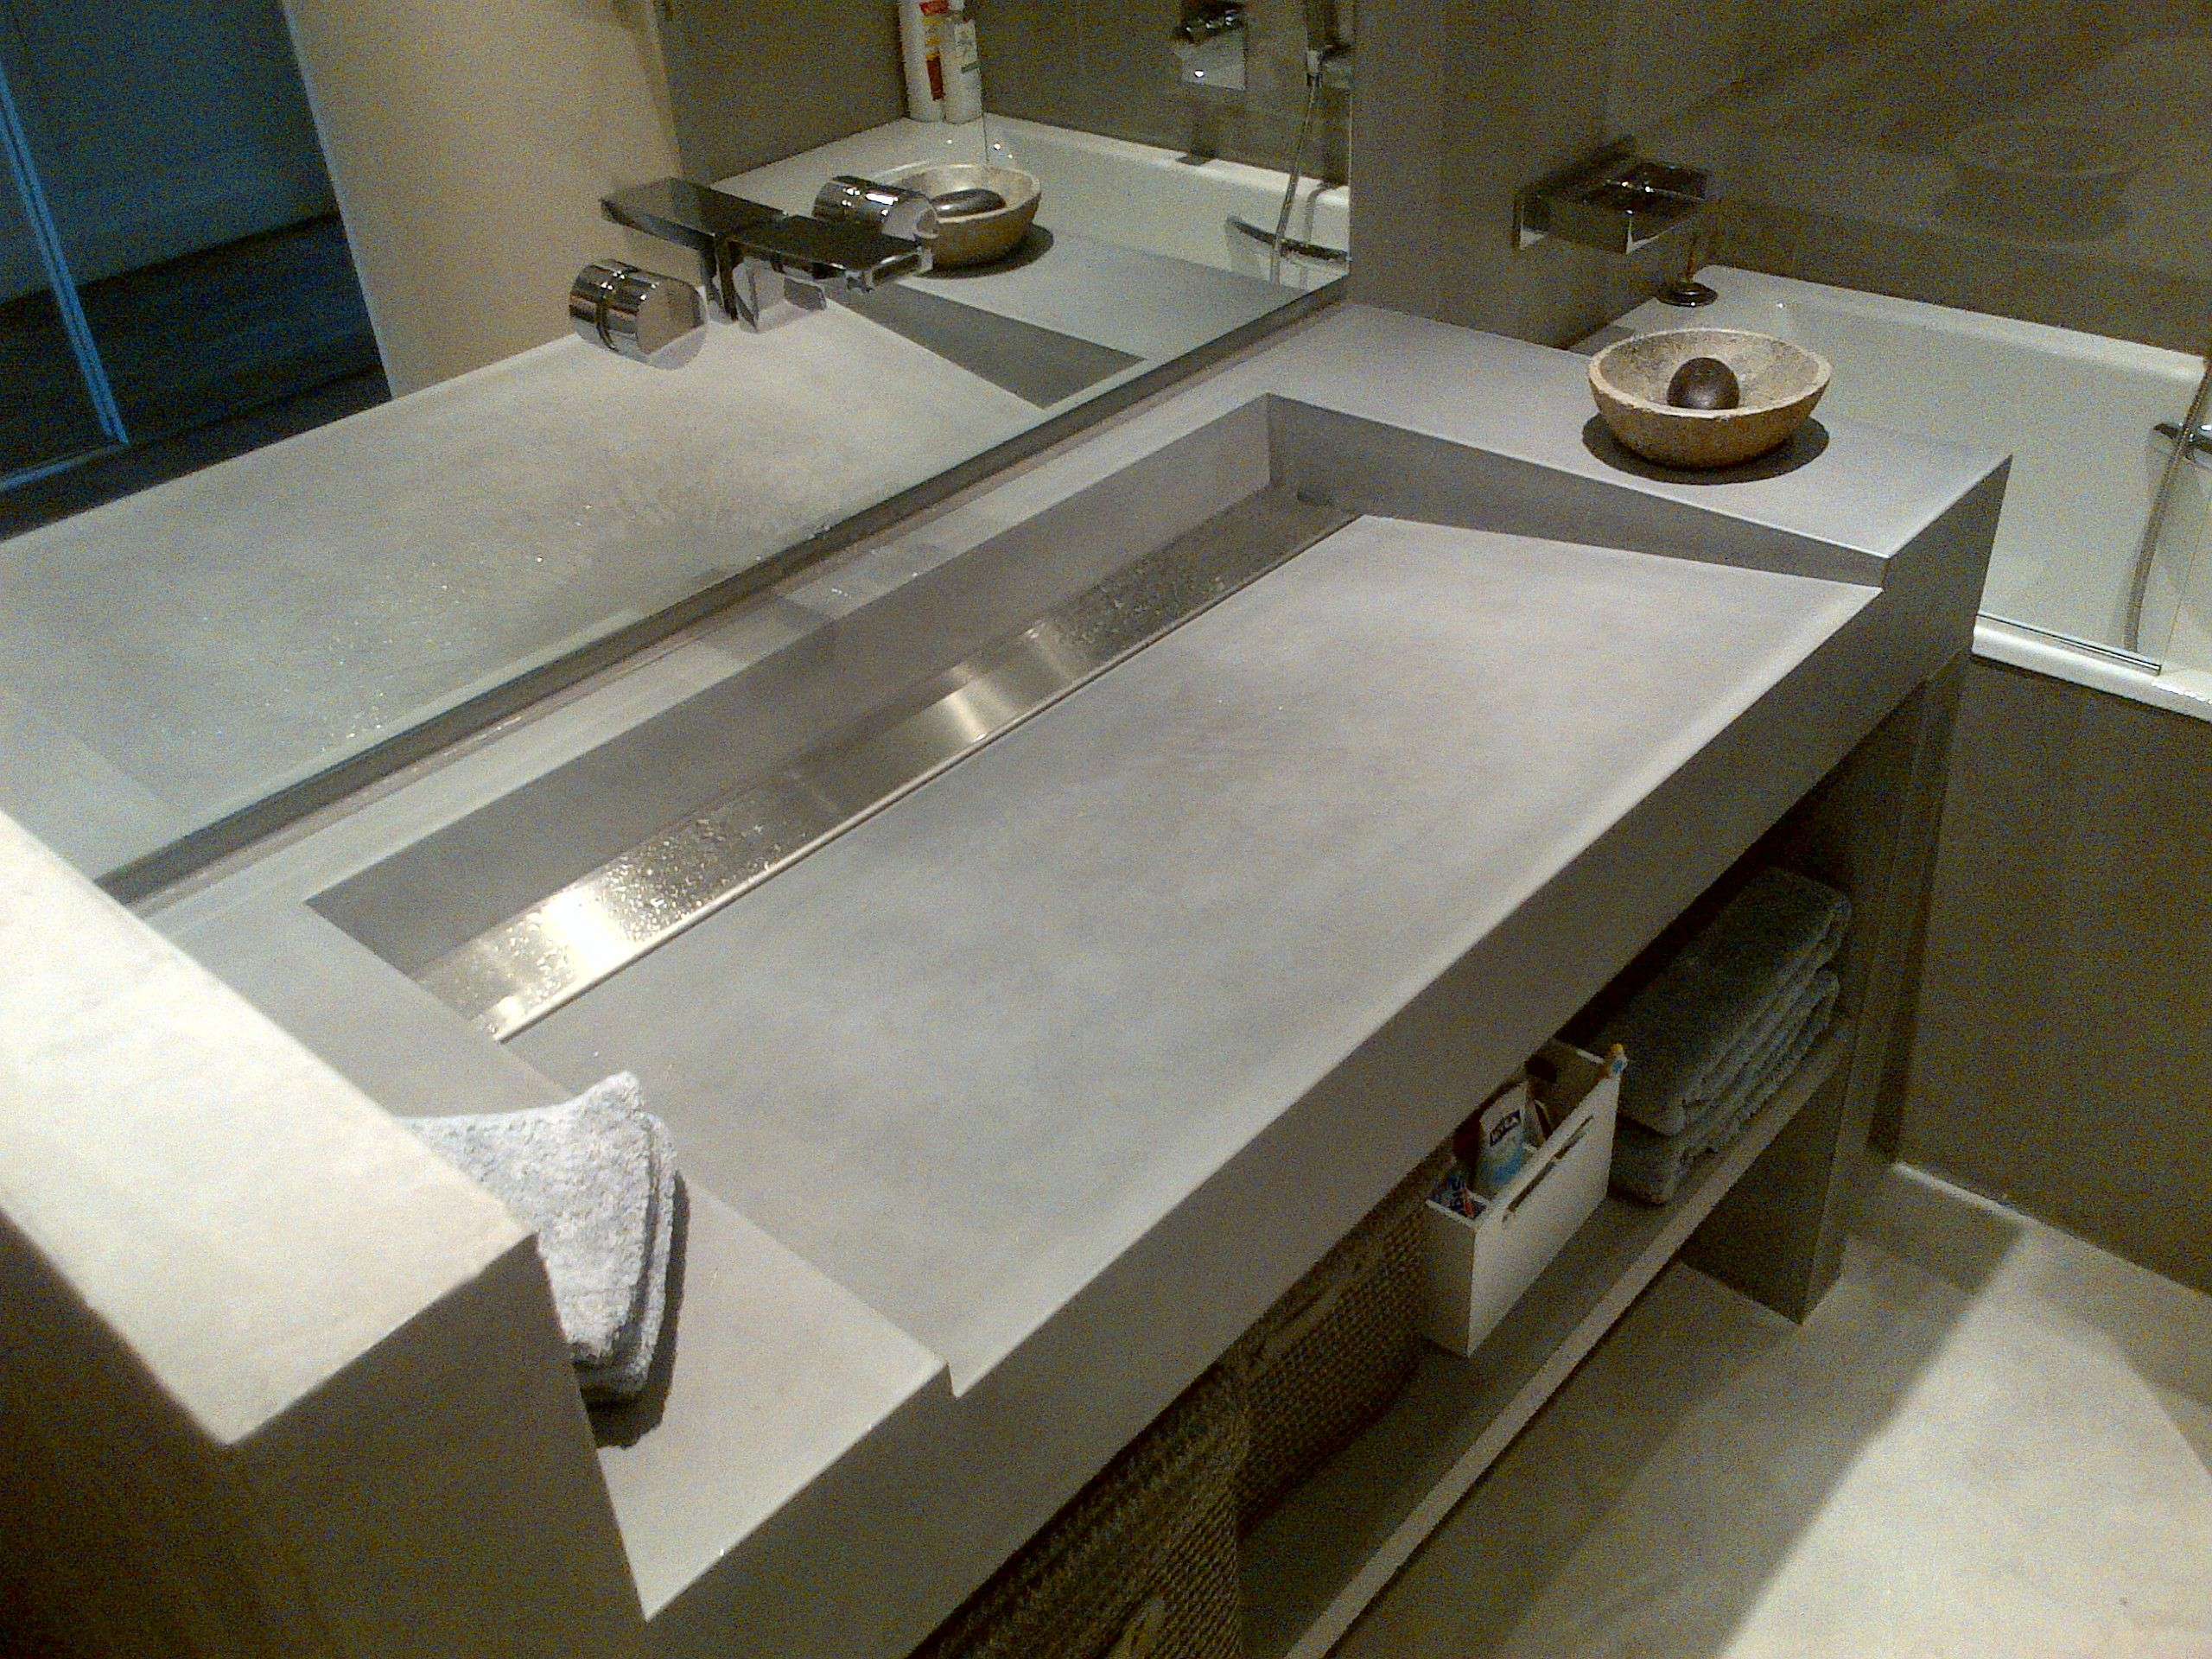 vasques b ton inox bross concrete by lcda inspiration hotel salle de bain vasque et. Black Bedroom Furniture Sets. Home Design Ideas